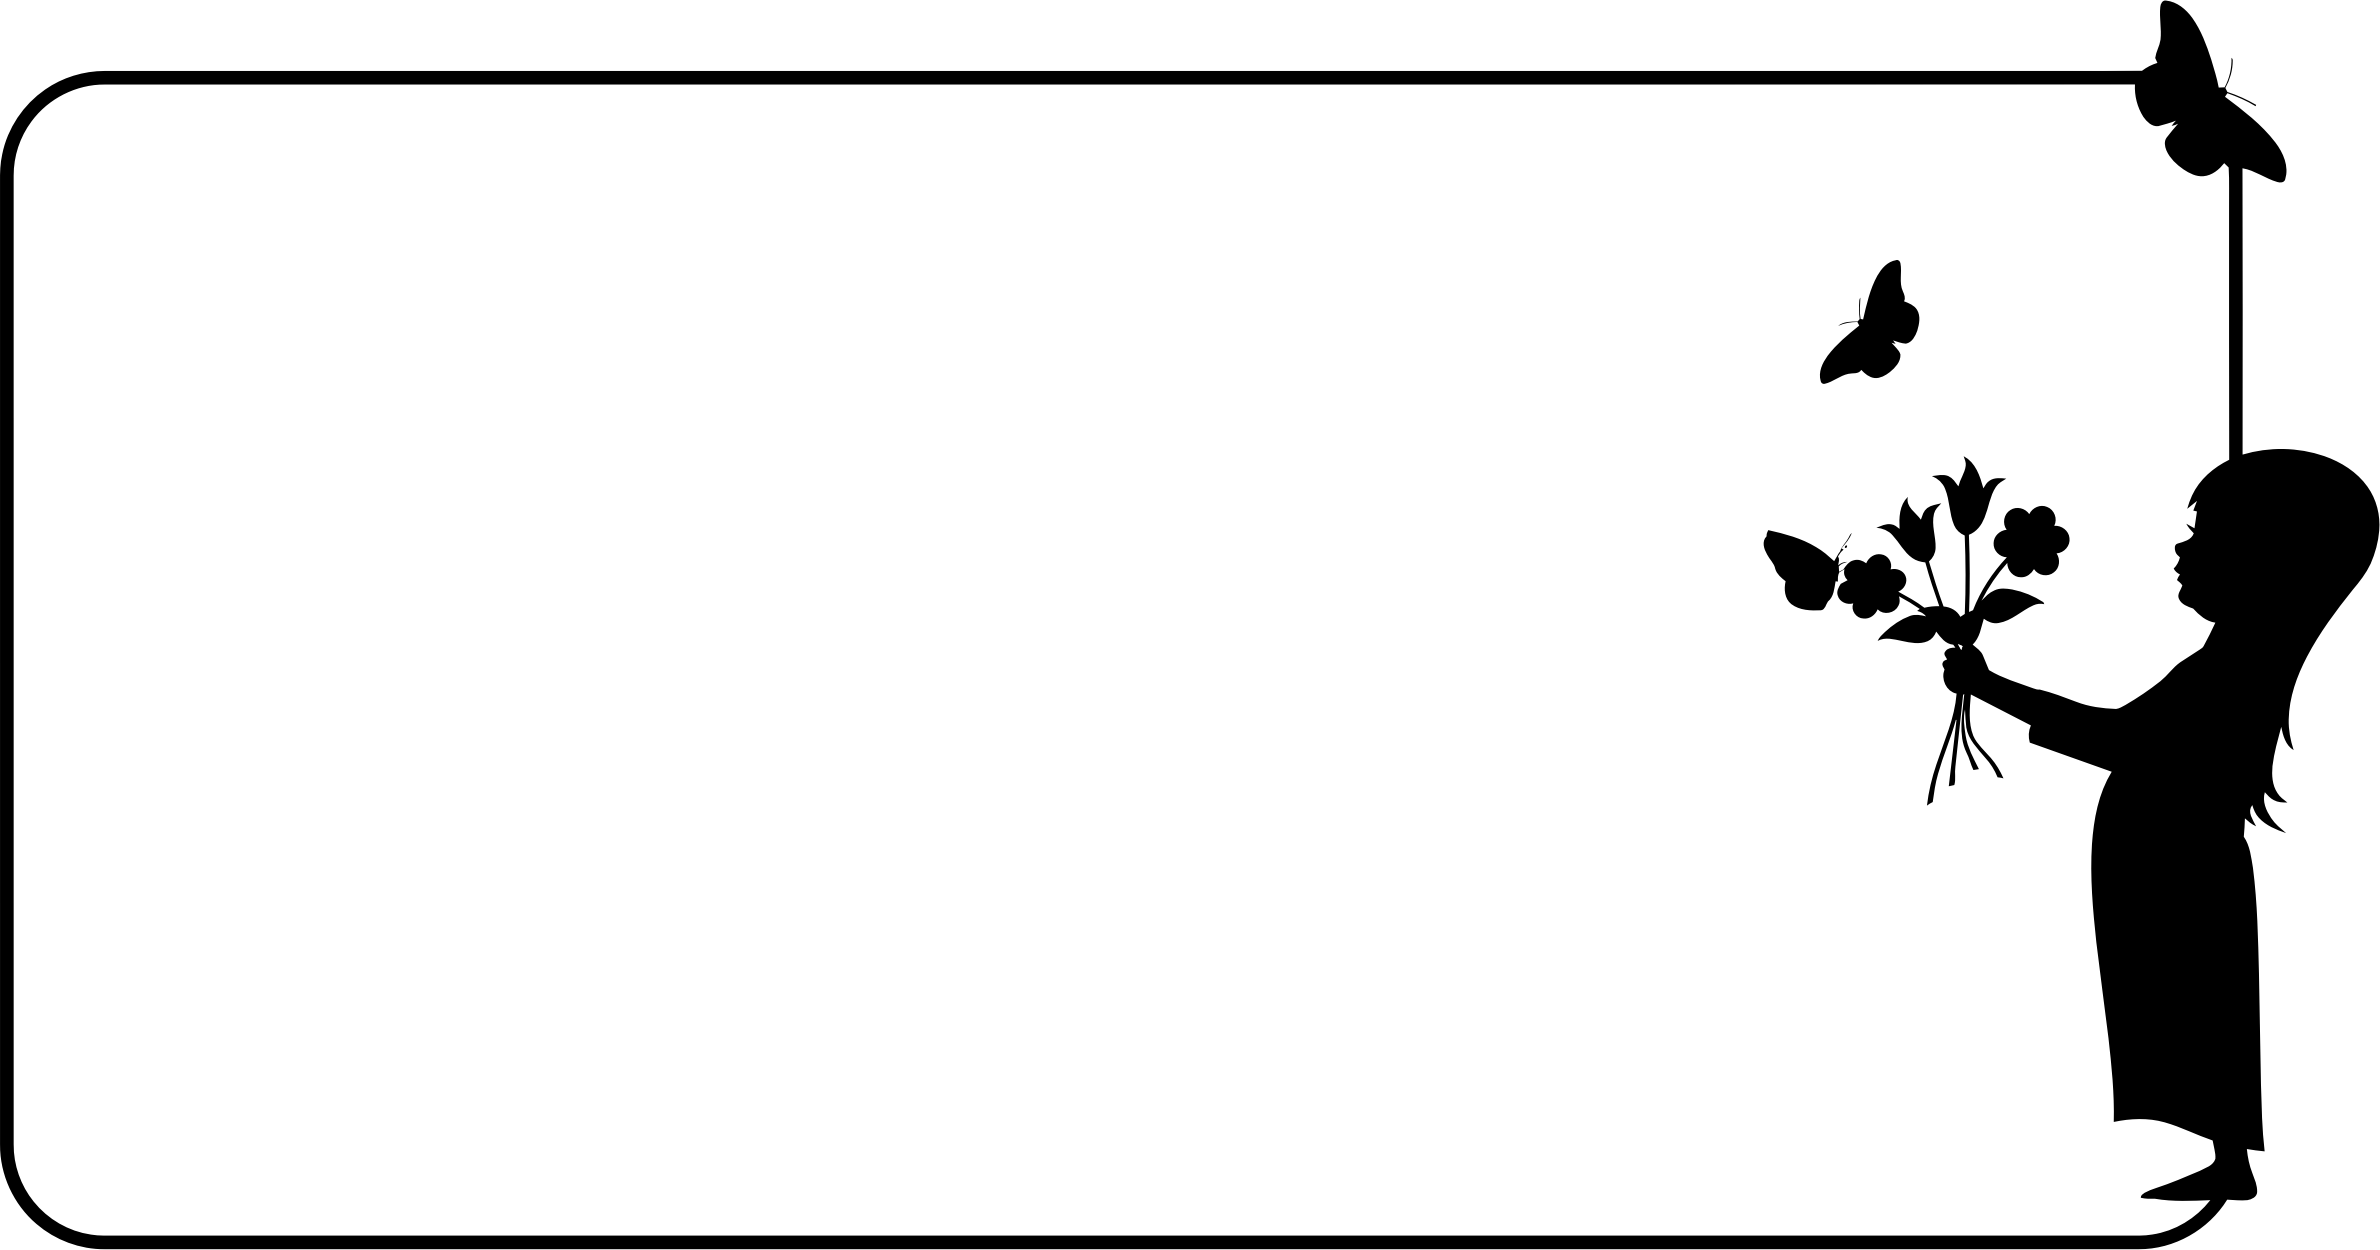 Flower frame clipart black and white vector Clipart - Girl With Flowers Frame vector